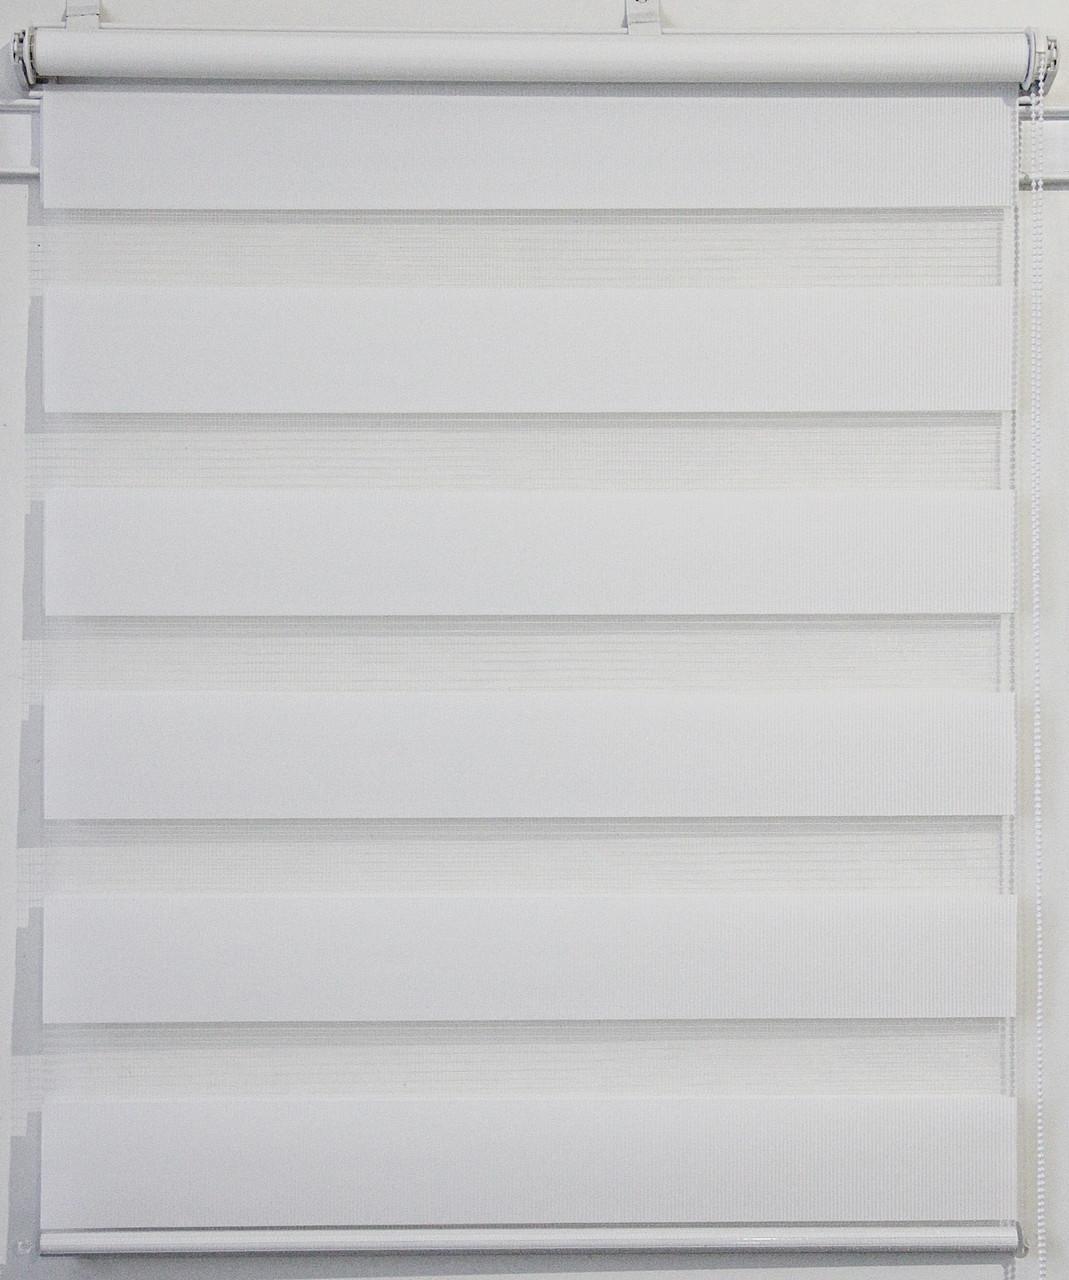 Рулонная штора 850*1300 ВН-01 Белый